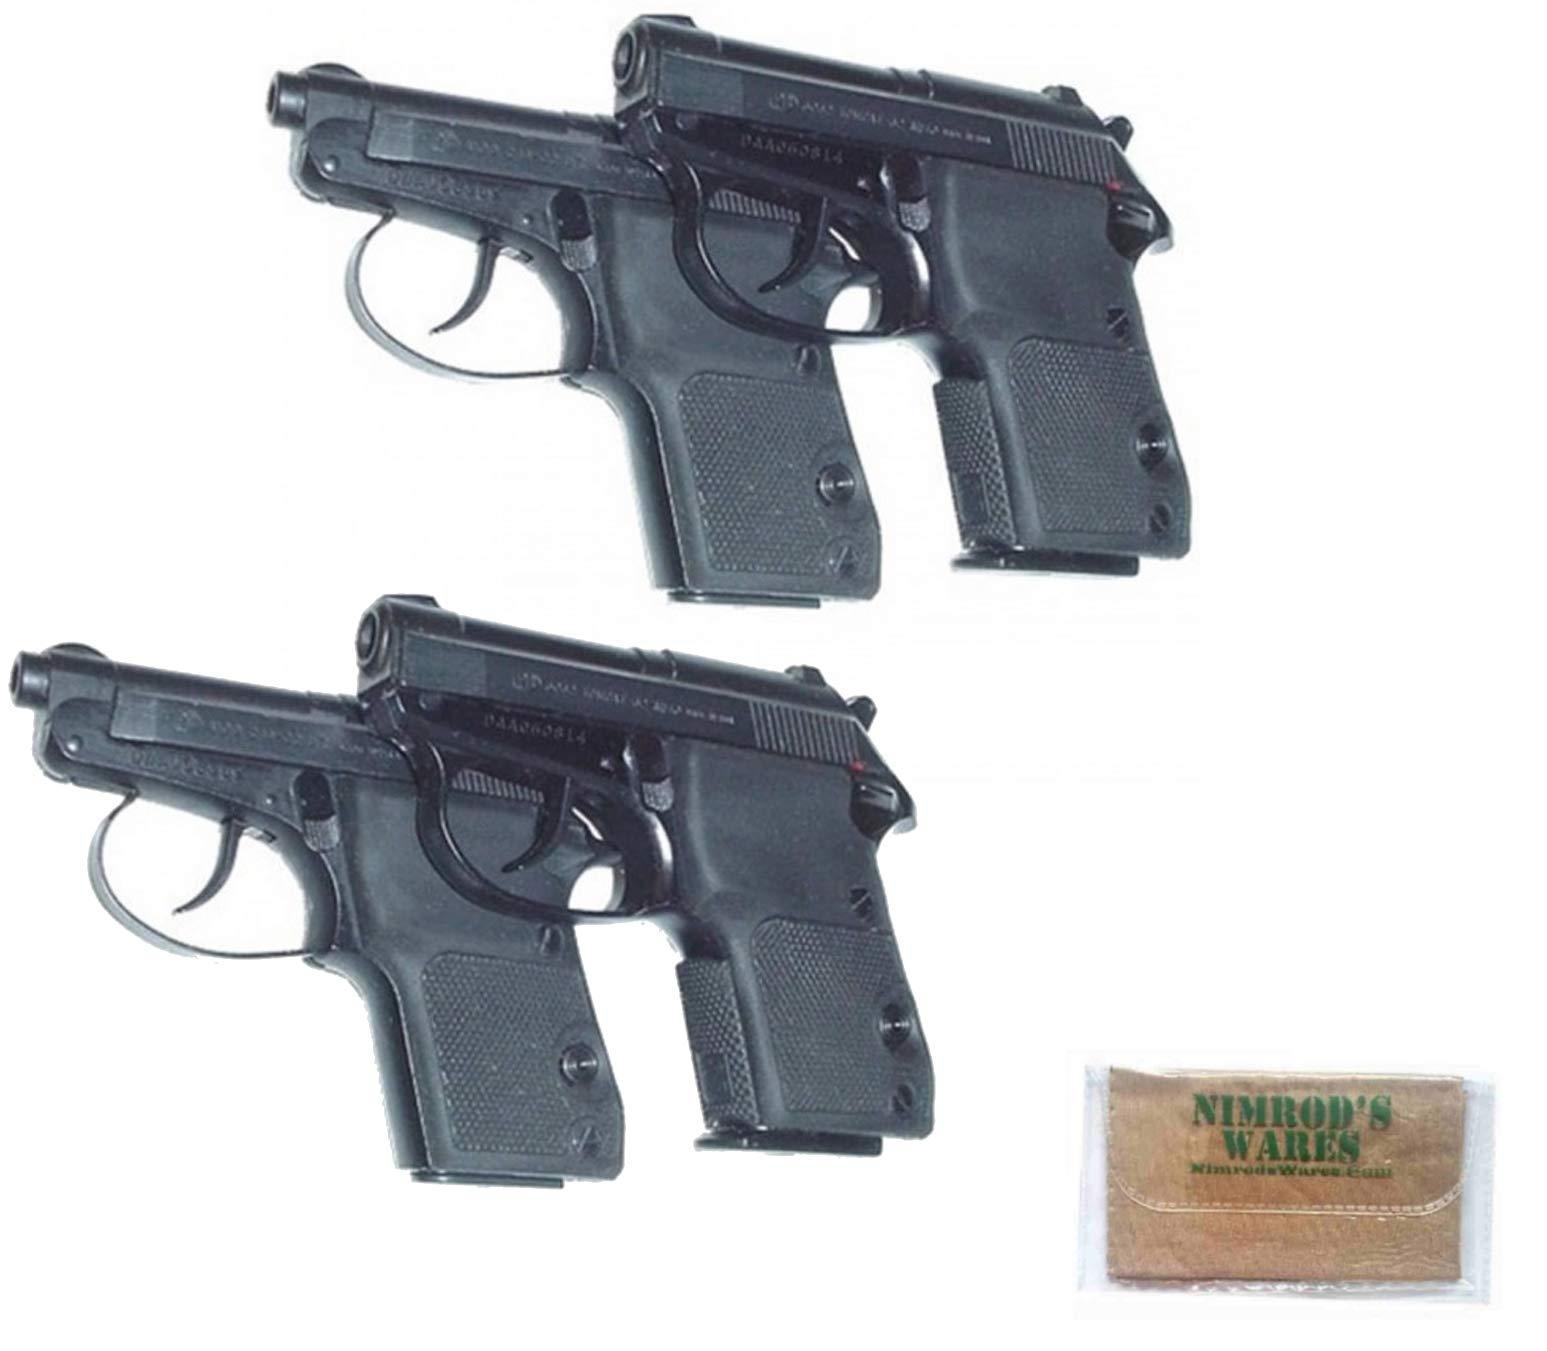 Nimrod's Wares 2-Pack Pearce Grip Beretta Bobcat 21A Tomcat 3032 Wrap-Around Grips PG-32 Microfiber Cloth by Nimrod's Wares